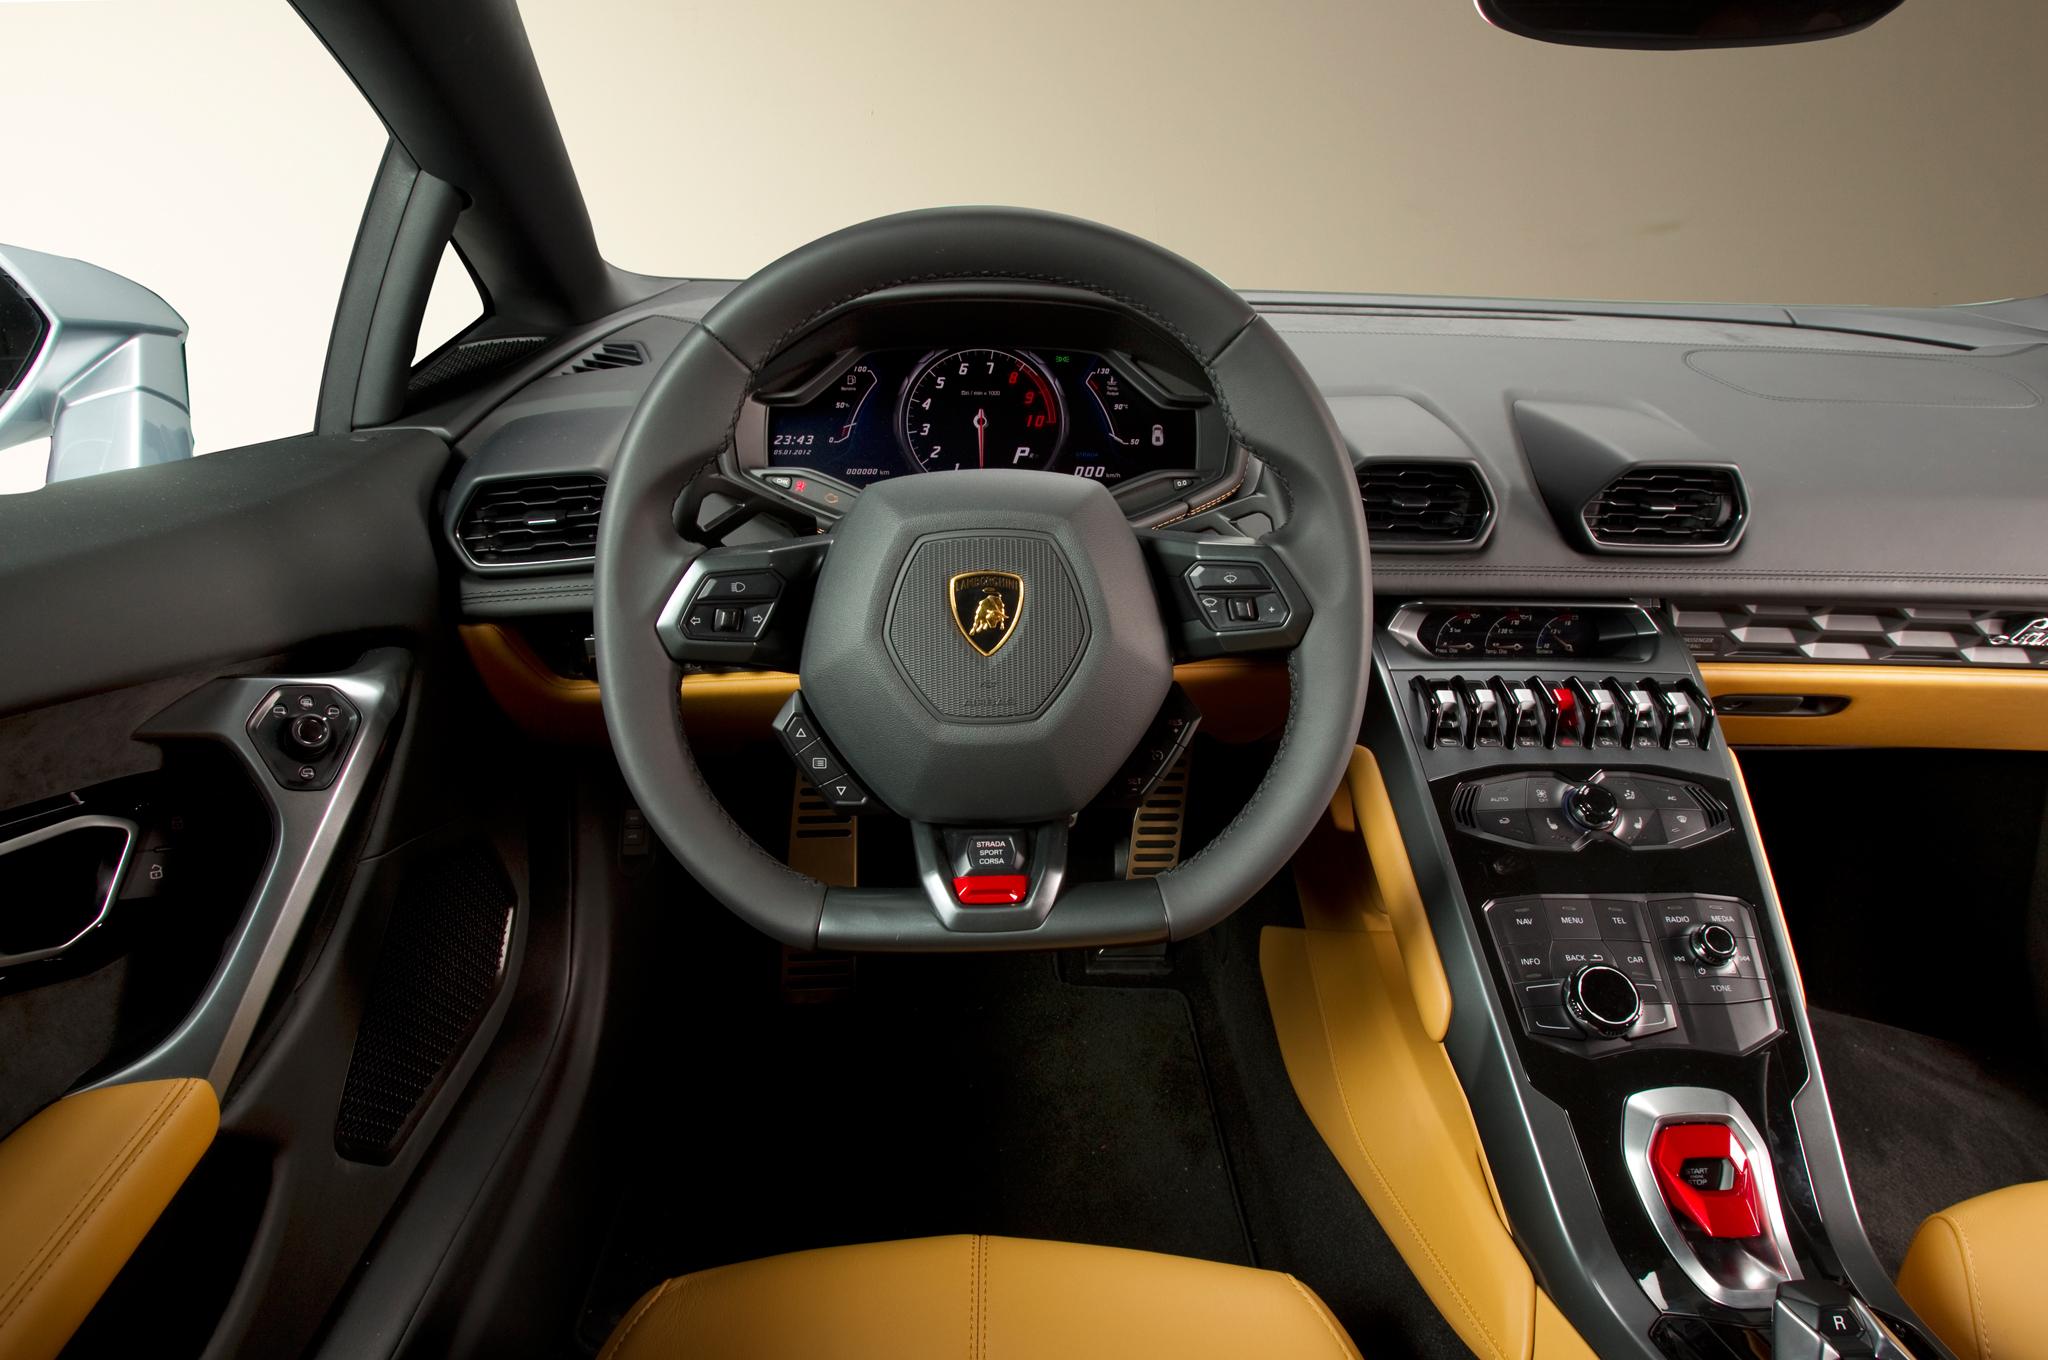 http—image.motortrend.com-f-roadtests-exotic-1312_2015_lamborghini_huracan_first_look-59411537-2015-Lamborghini-Huracan-cockpit